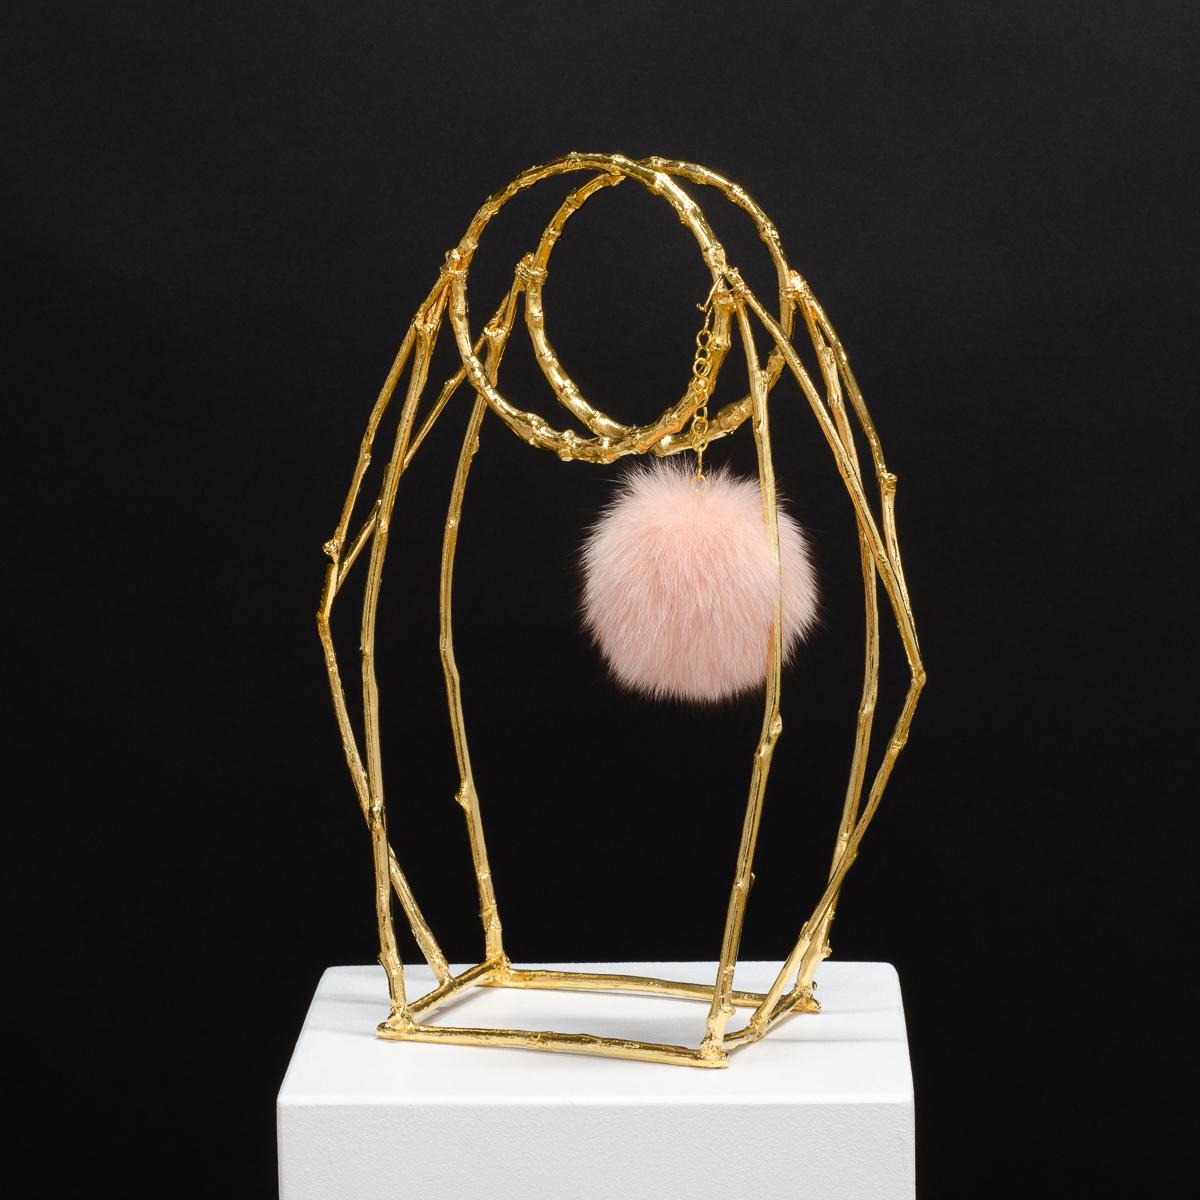 DARONA, Sculpture by Beatriz Gerenstein. Handbag made in Bronze, 24K Gold plating, with a pinky fur pom-pom.